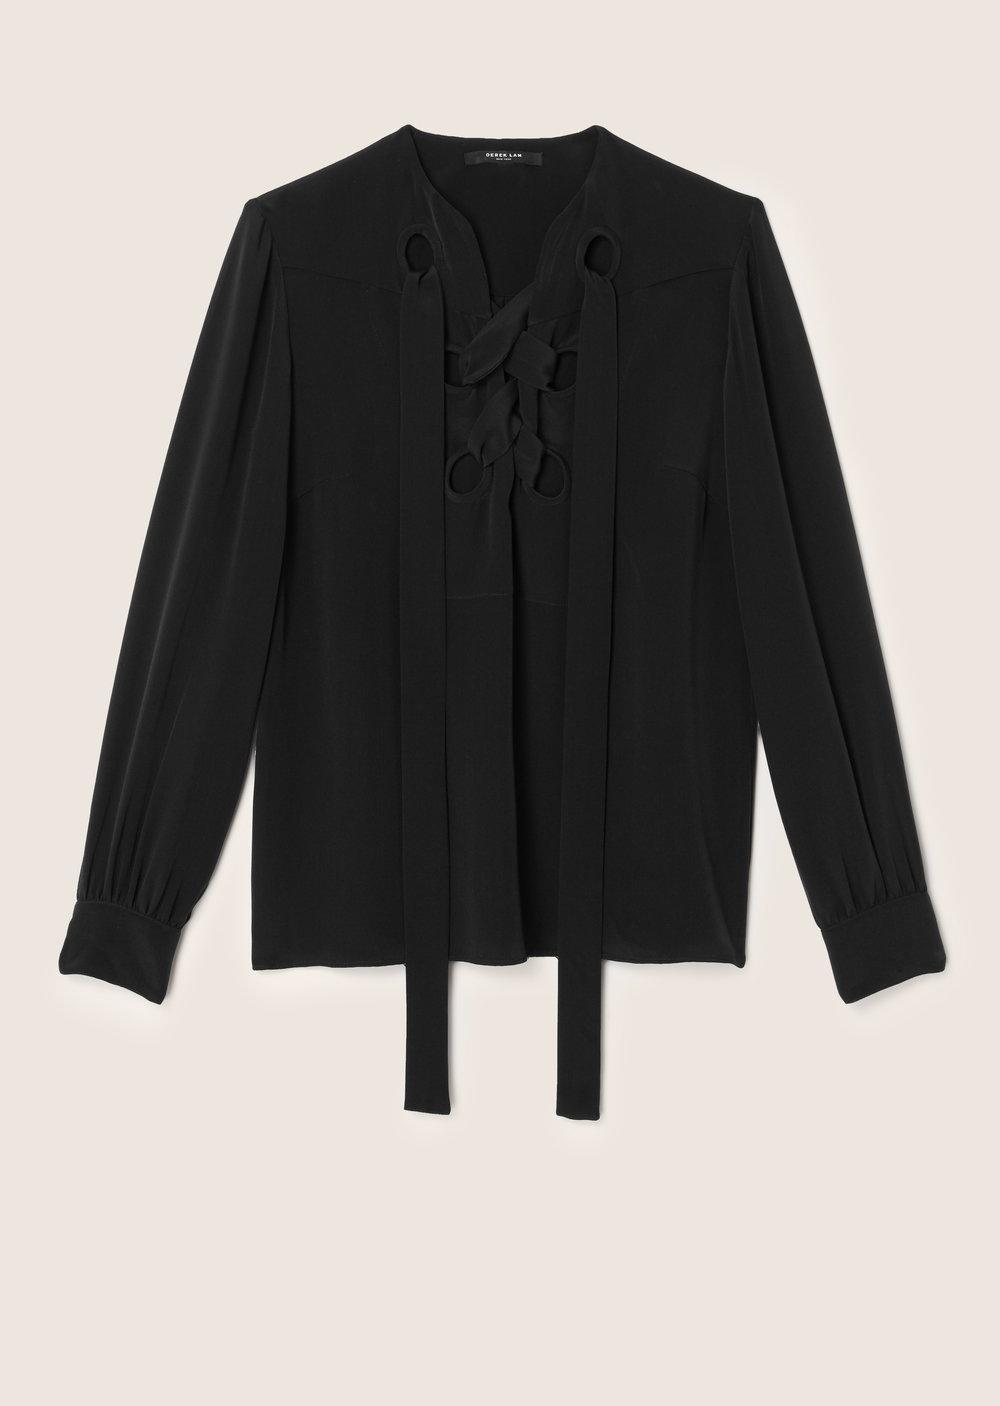 Derek Lam Sarah Lace-Up Blouse In Black